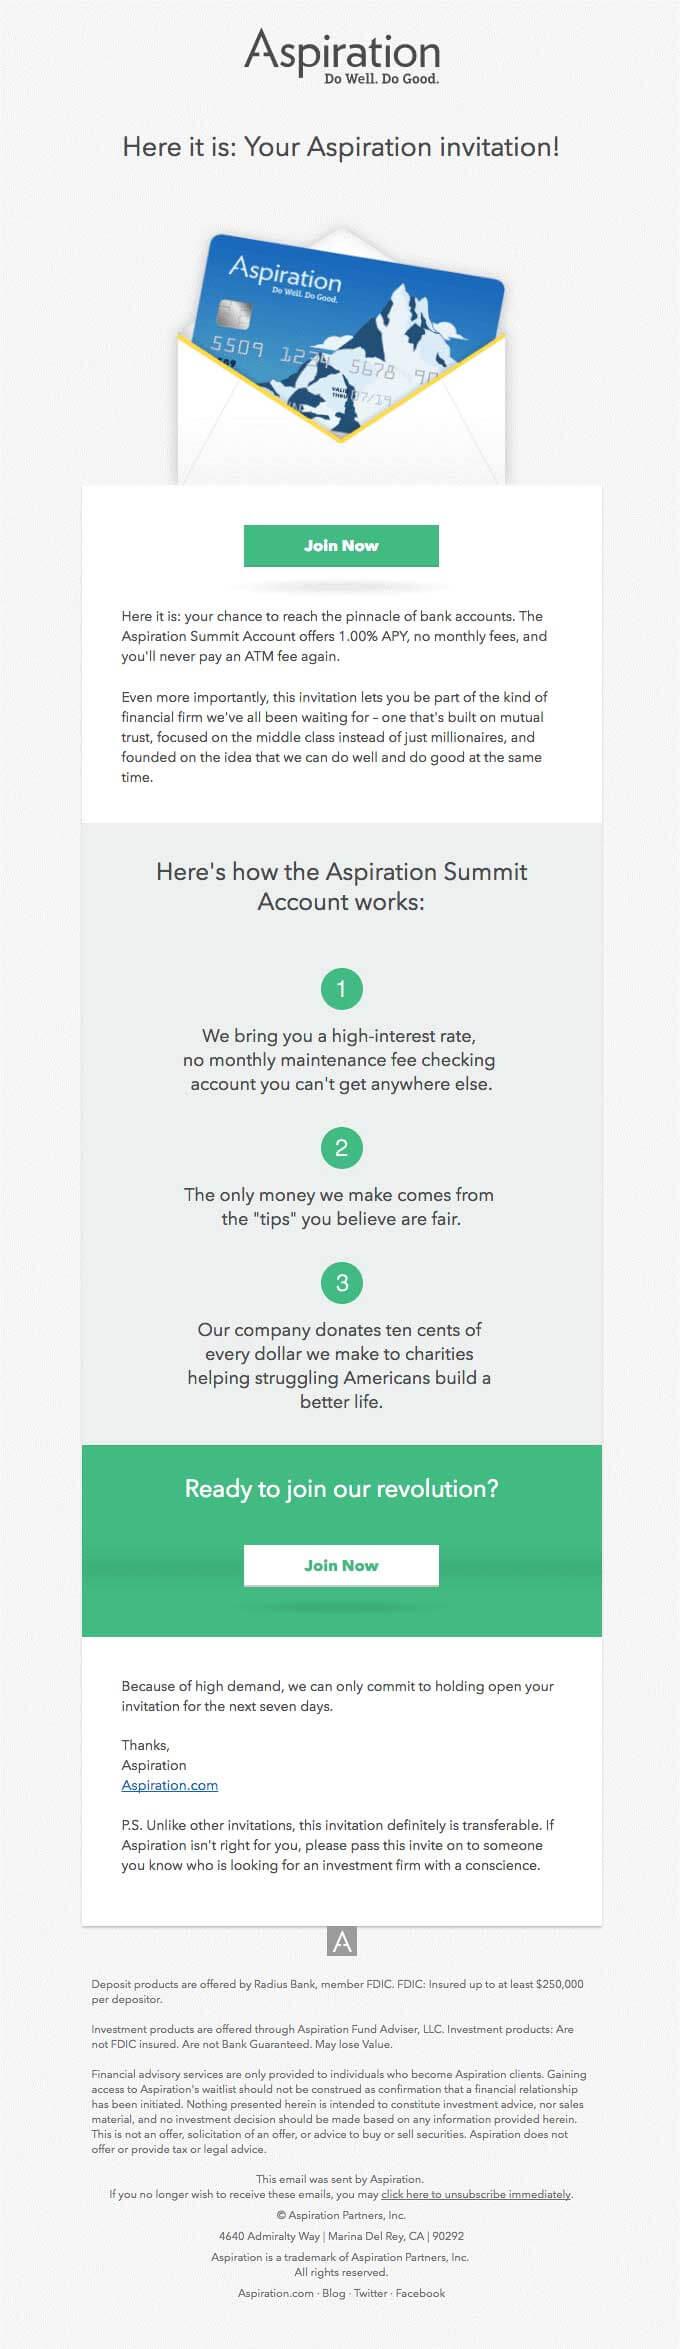 Aspirations-Bank-Email-Templates